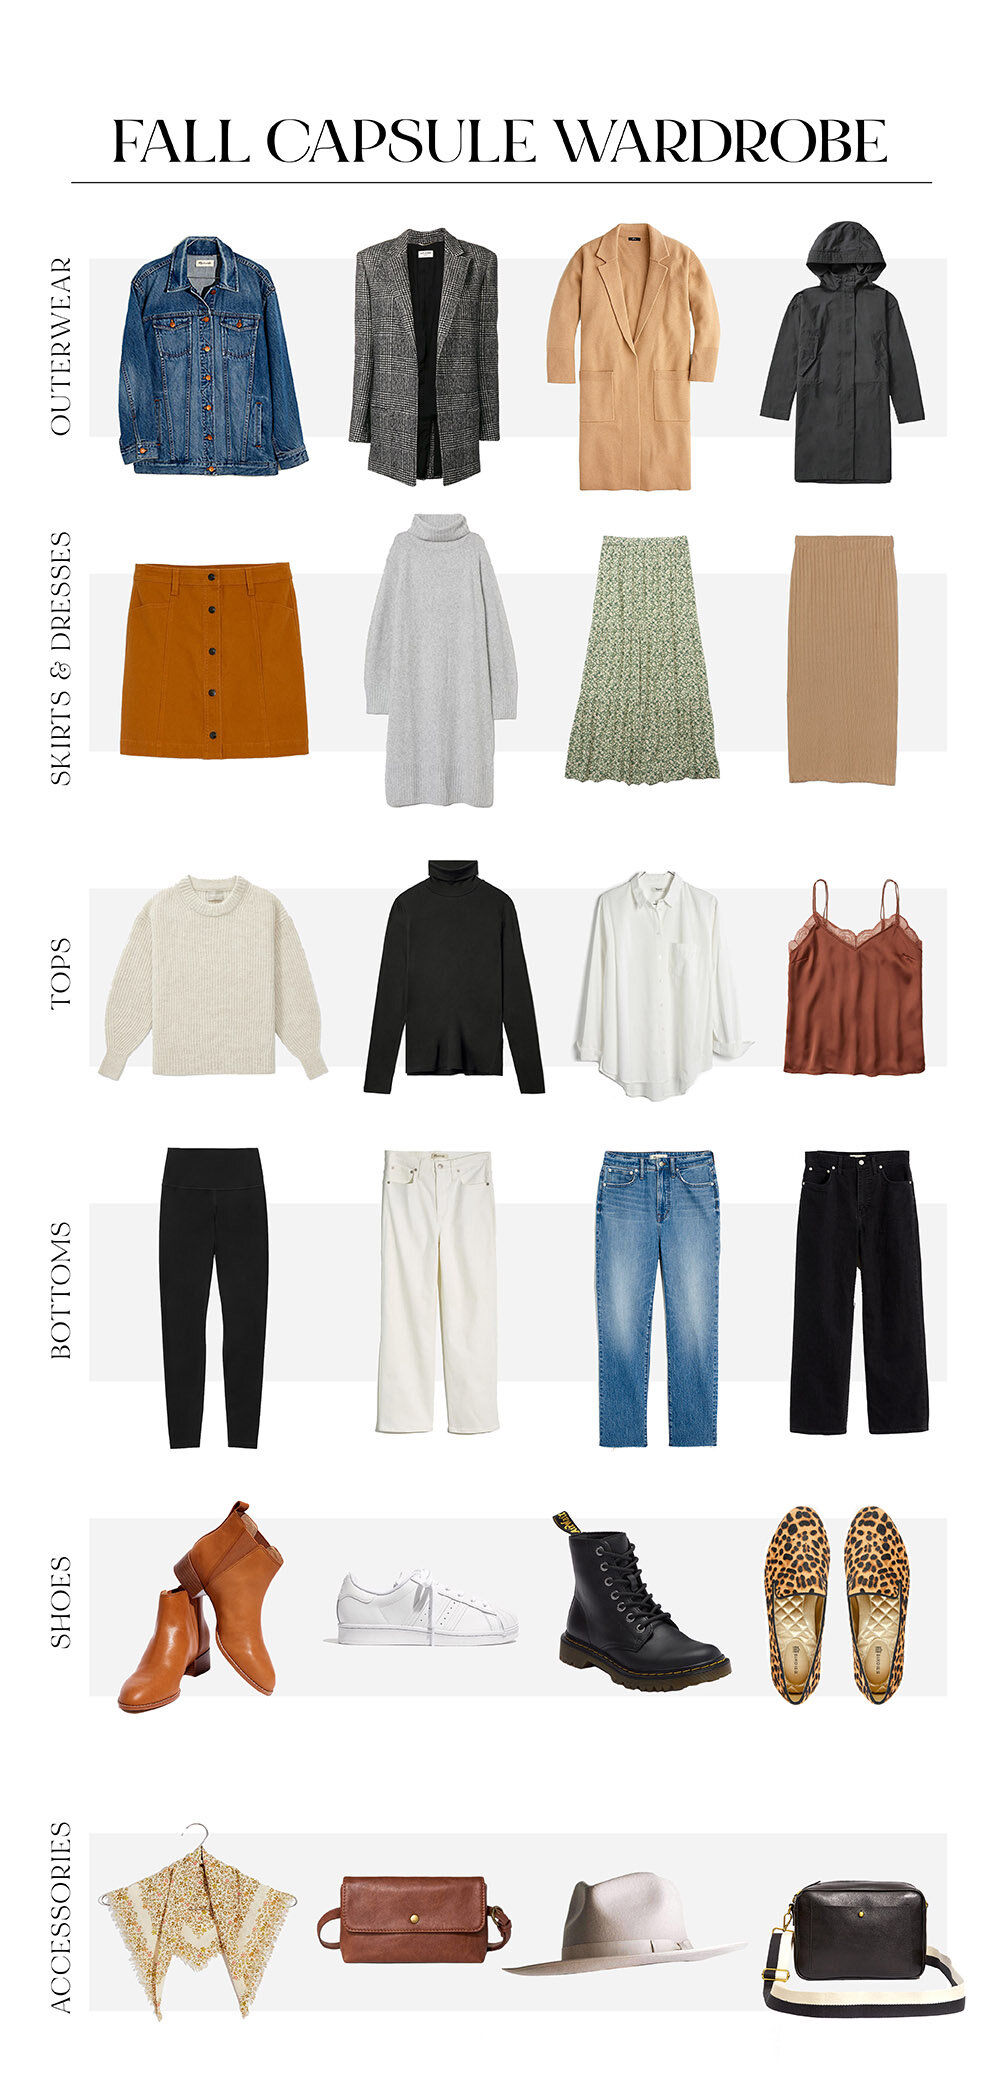 Fall Capsule Wardrobe 20 — By Olivia Lee